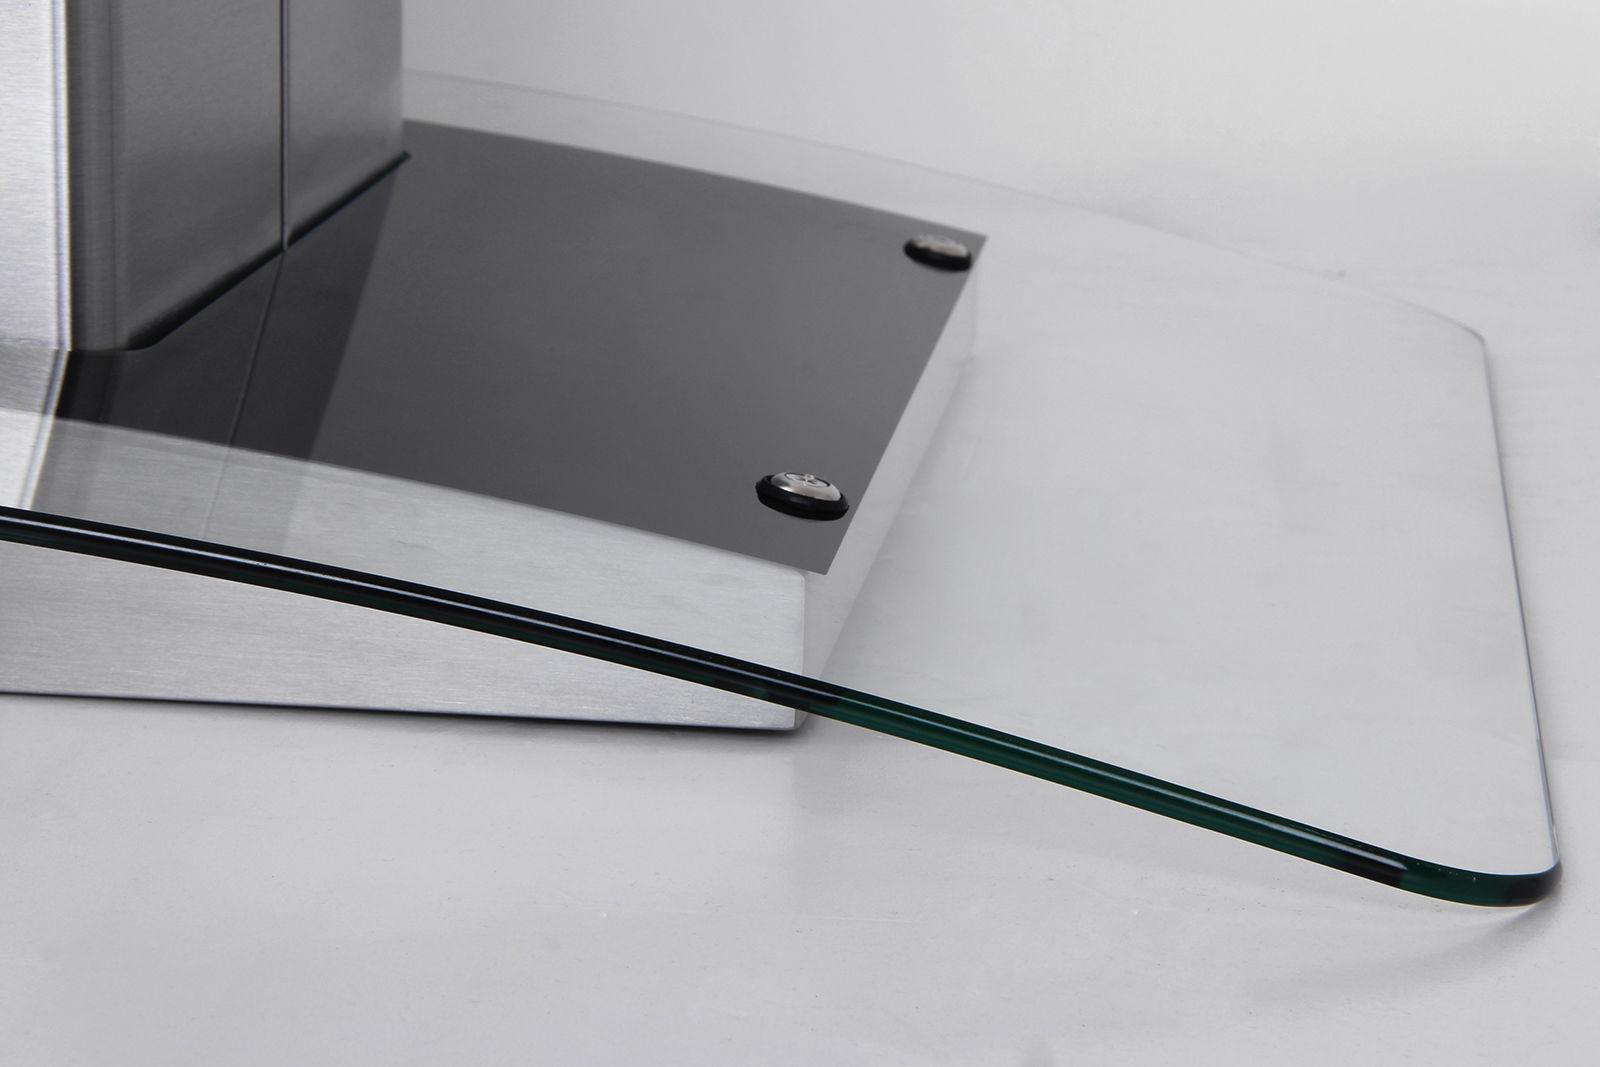 stylish ventless bathroom fan with light design-Beautiful Ventless Bathroom Fan with Light Construction